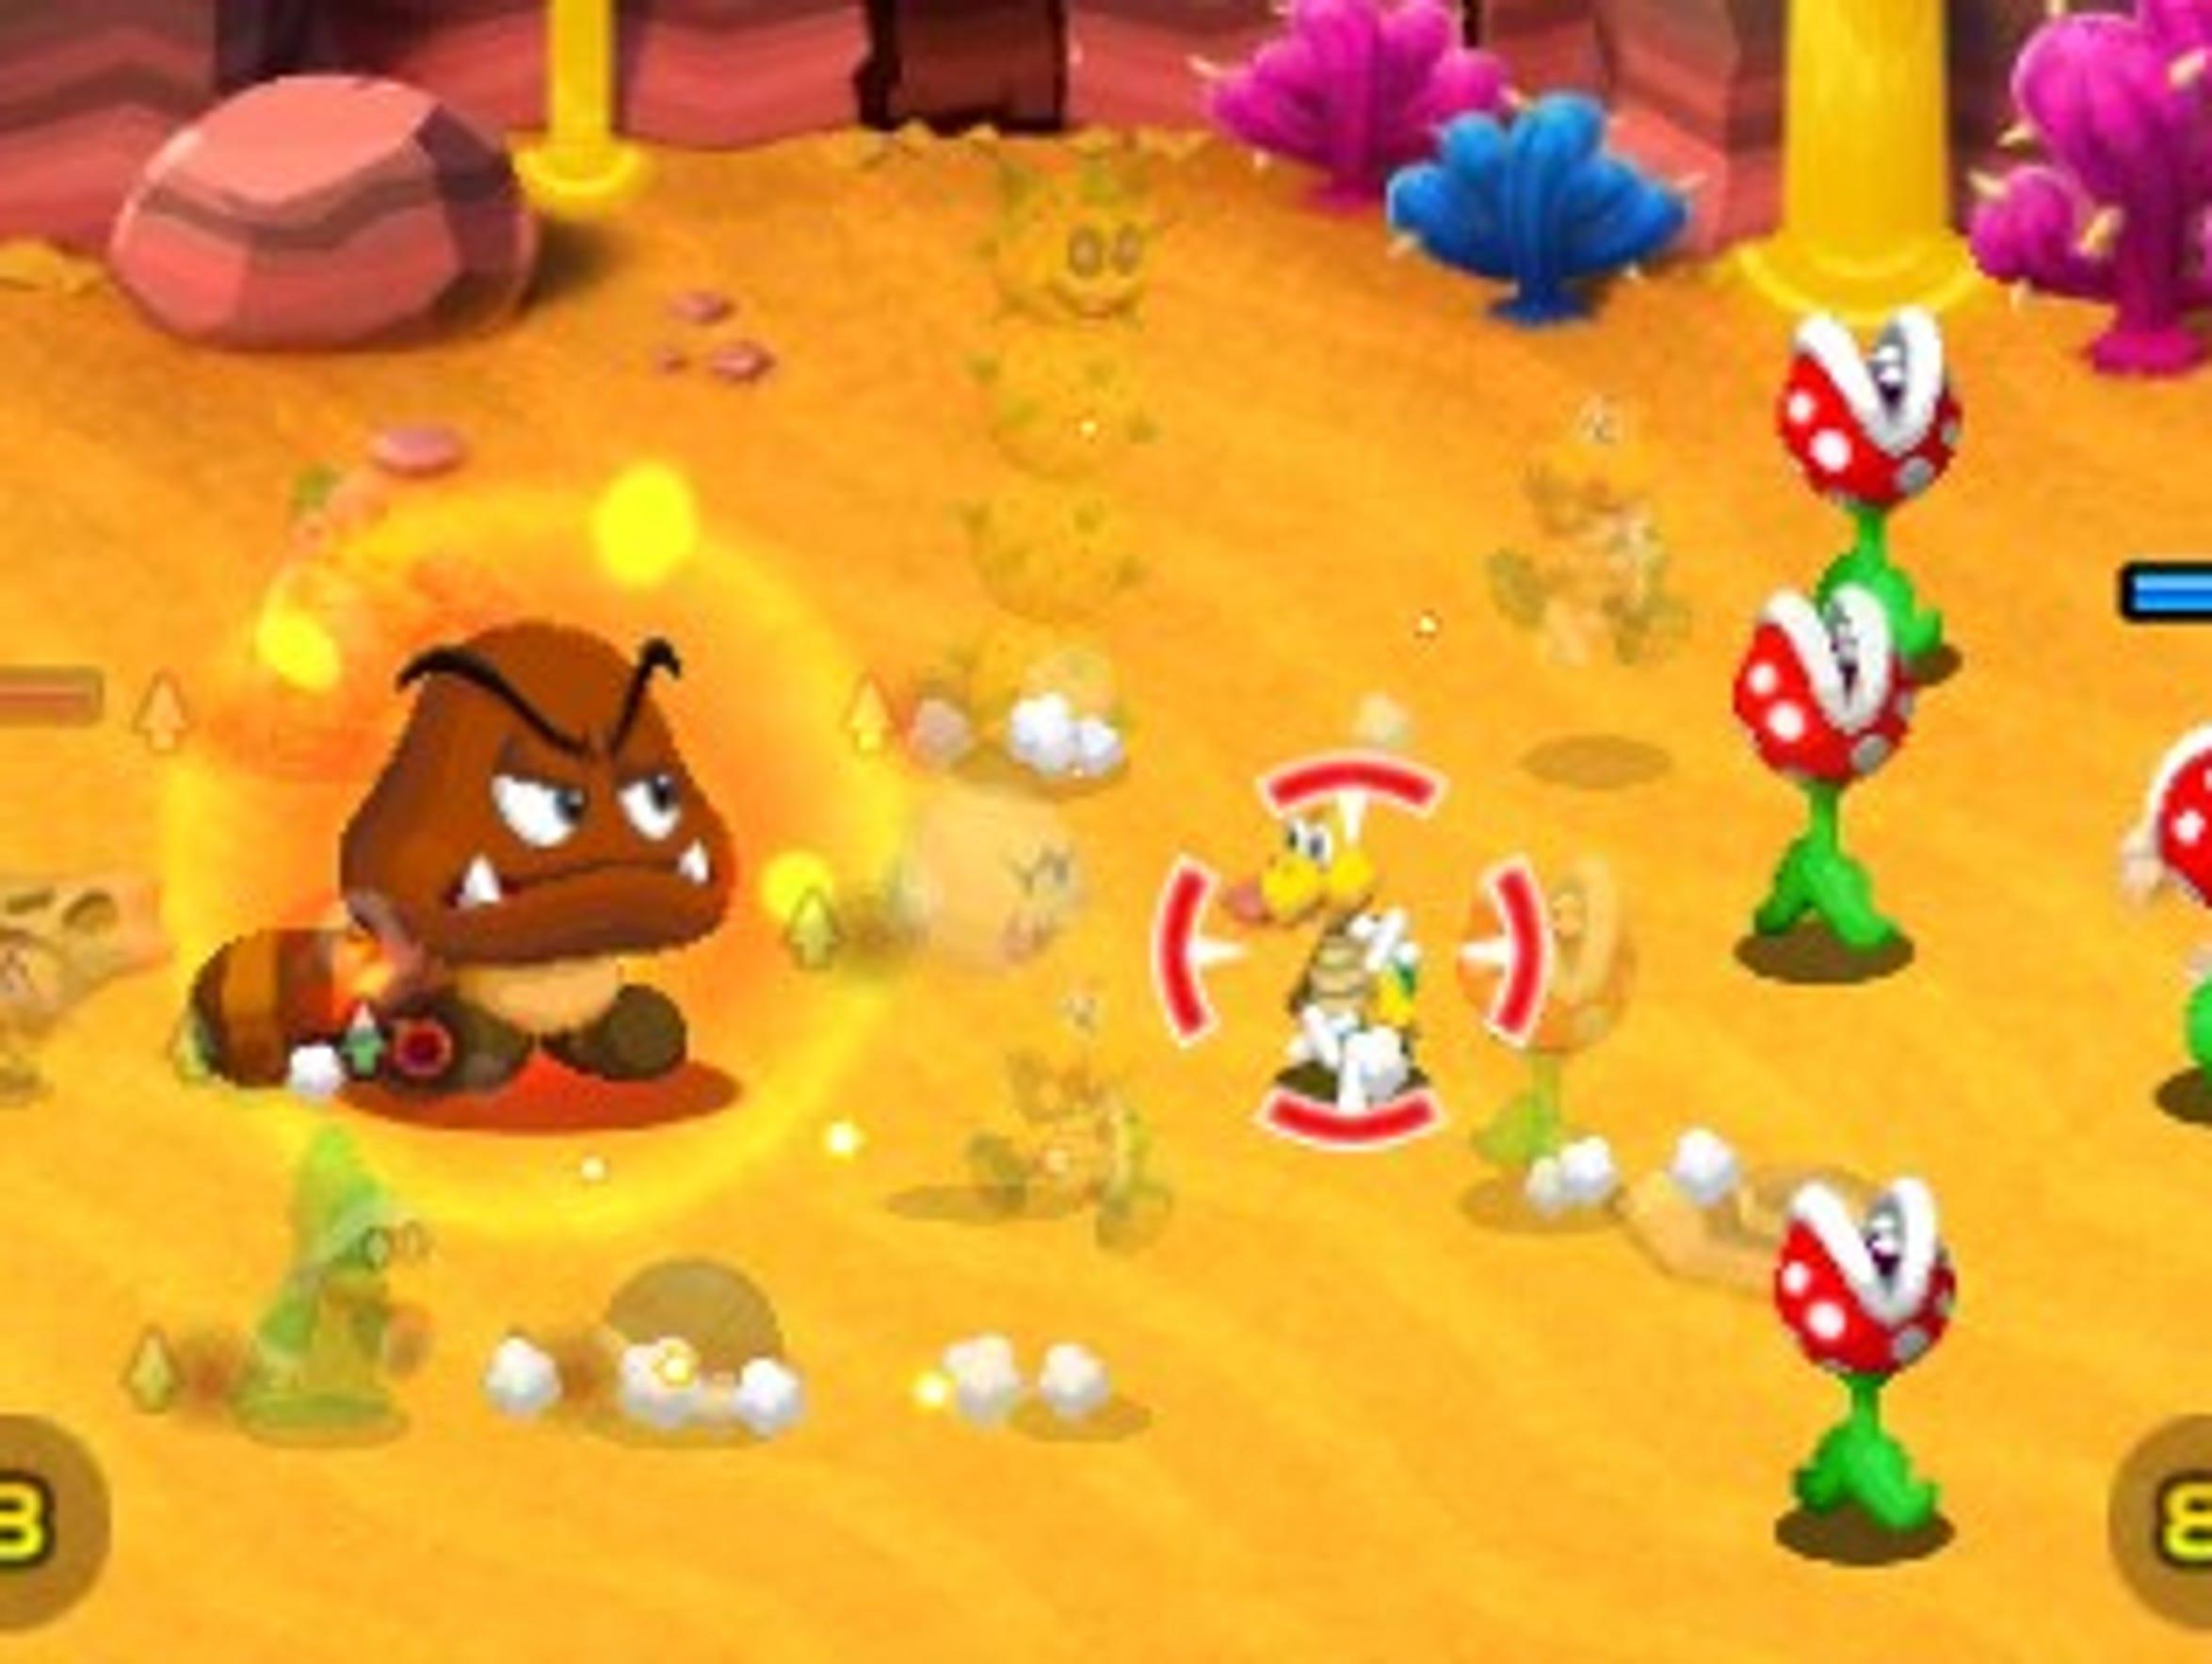 Mario & Luigi: Superstar Saga + Bowser's Minions for